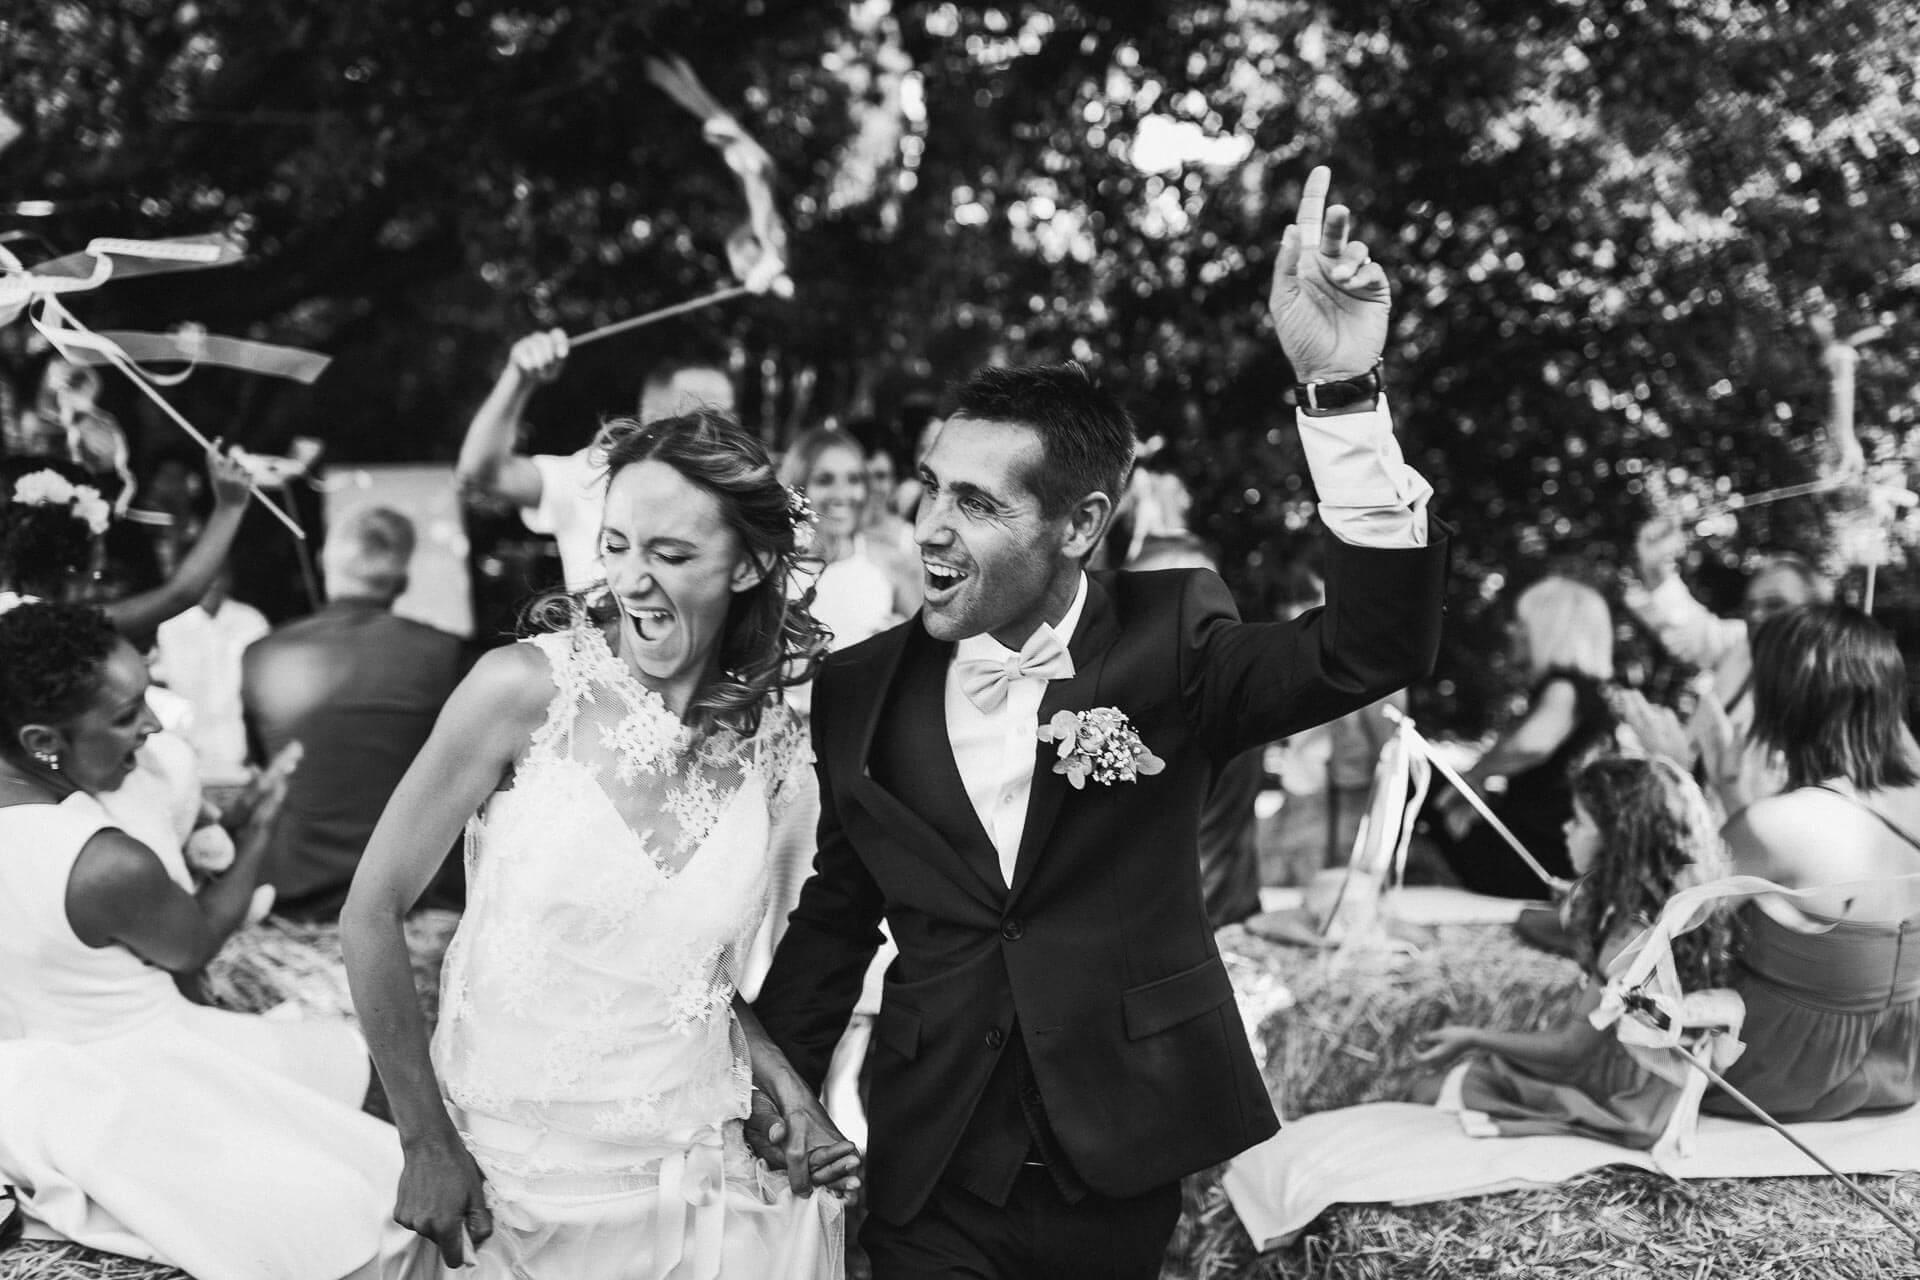 photographe-mariage-aix-en-provence-stephanie-jerome-16